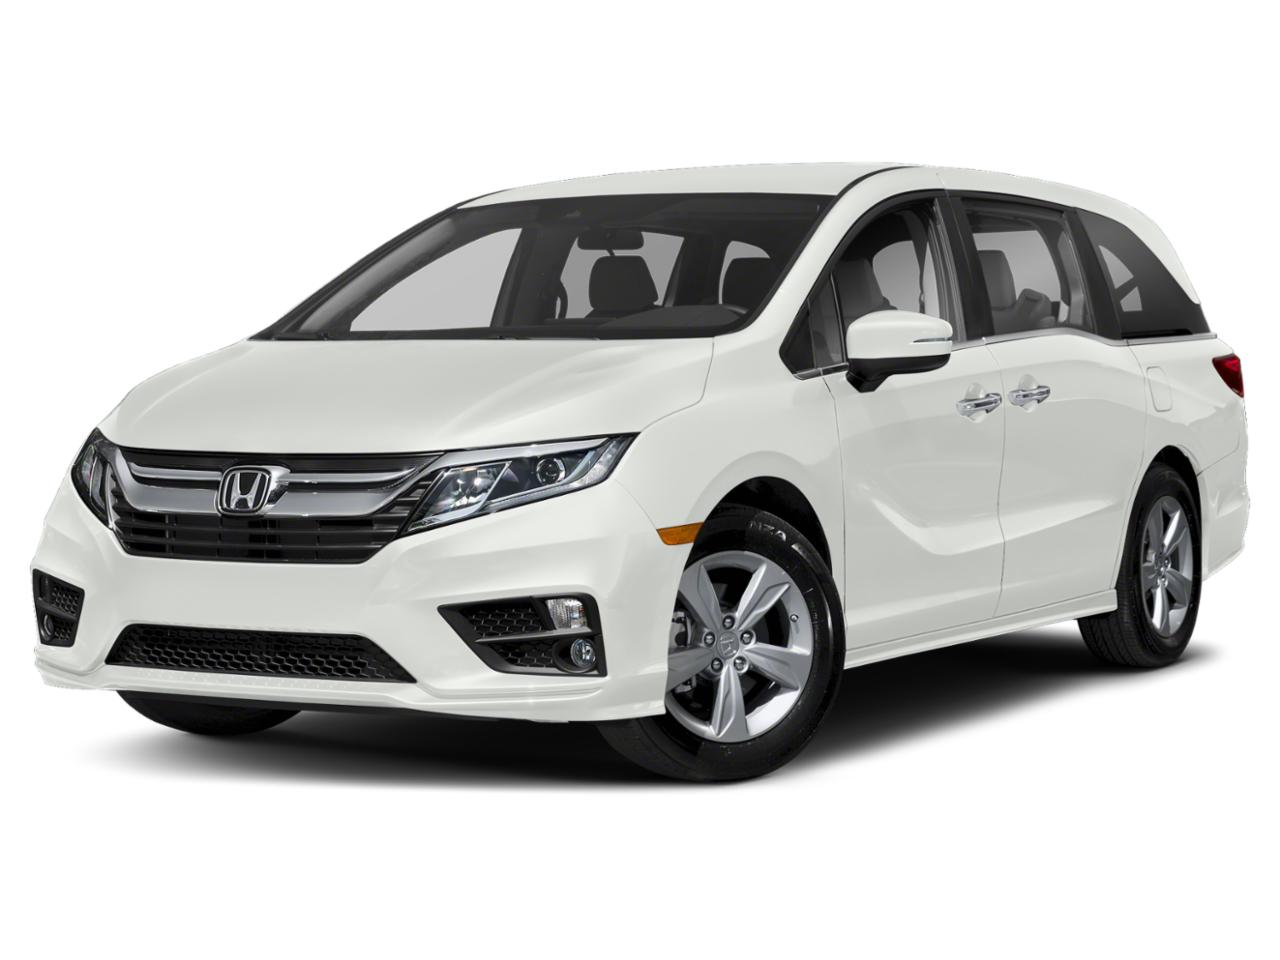 2020 Honda Odyssey Vehicle Photo in Wilmington, NC 28403